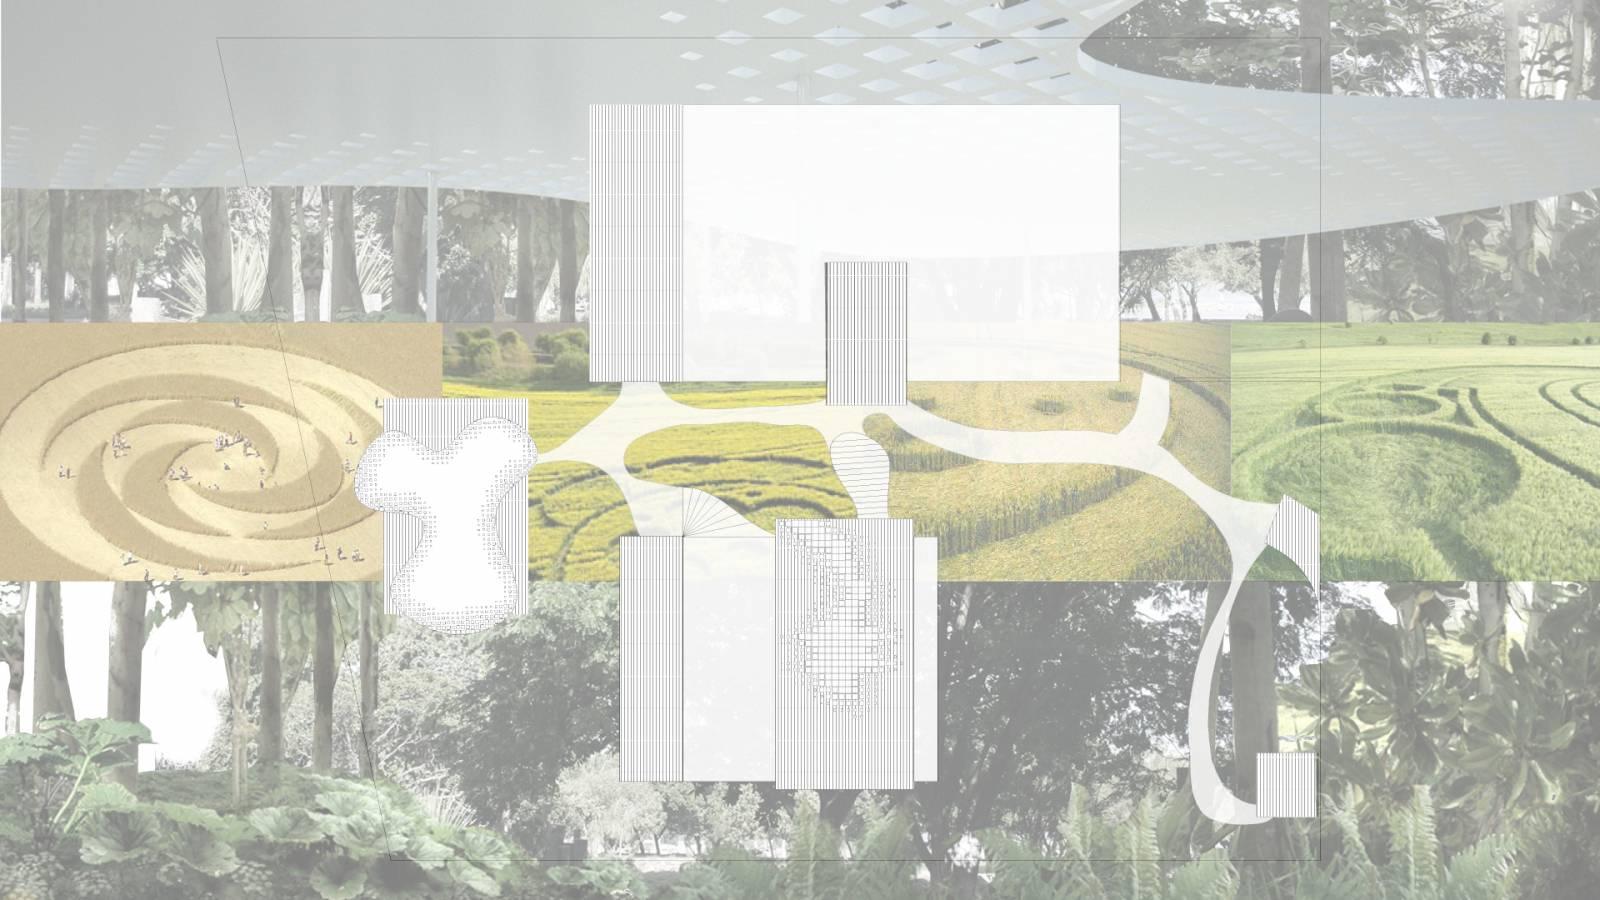 FINAL DIAGRAM - São Paulo Art Pavillion - SPOL Architects